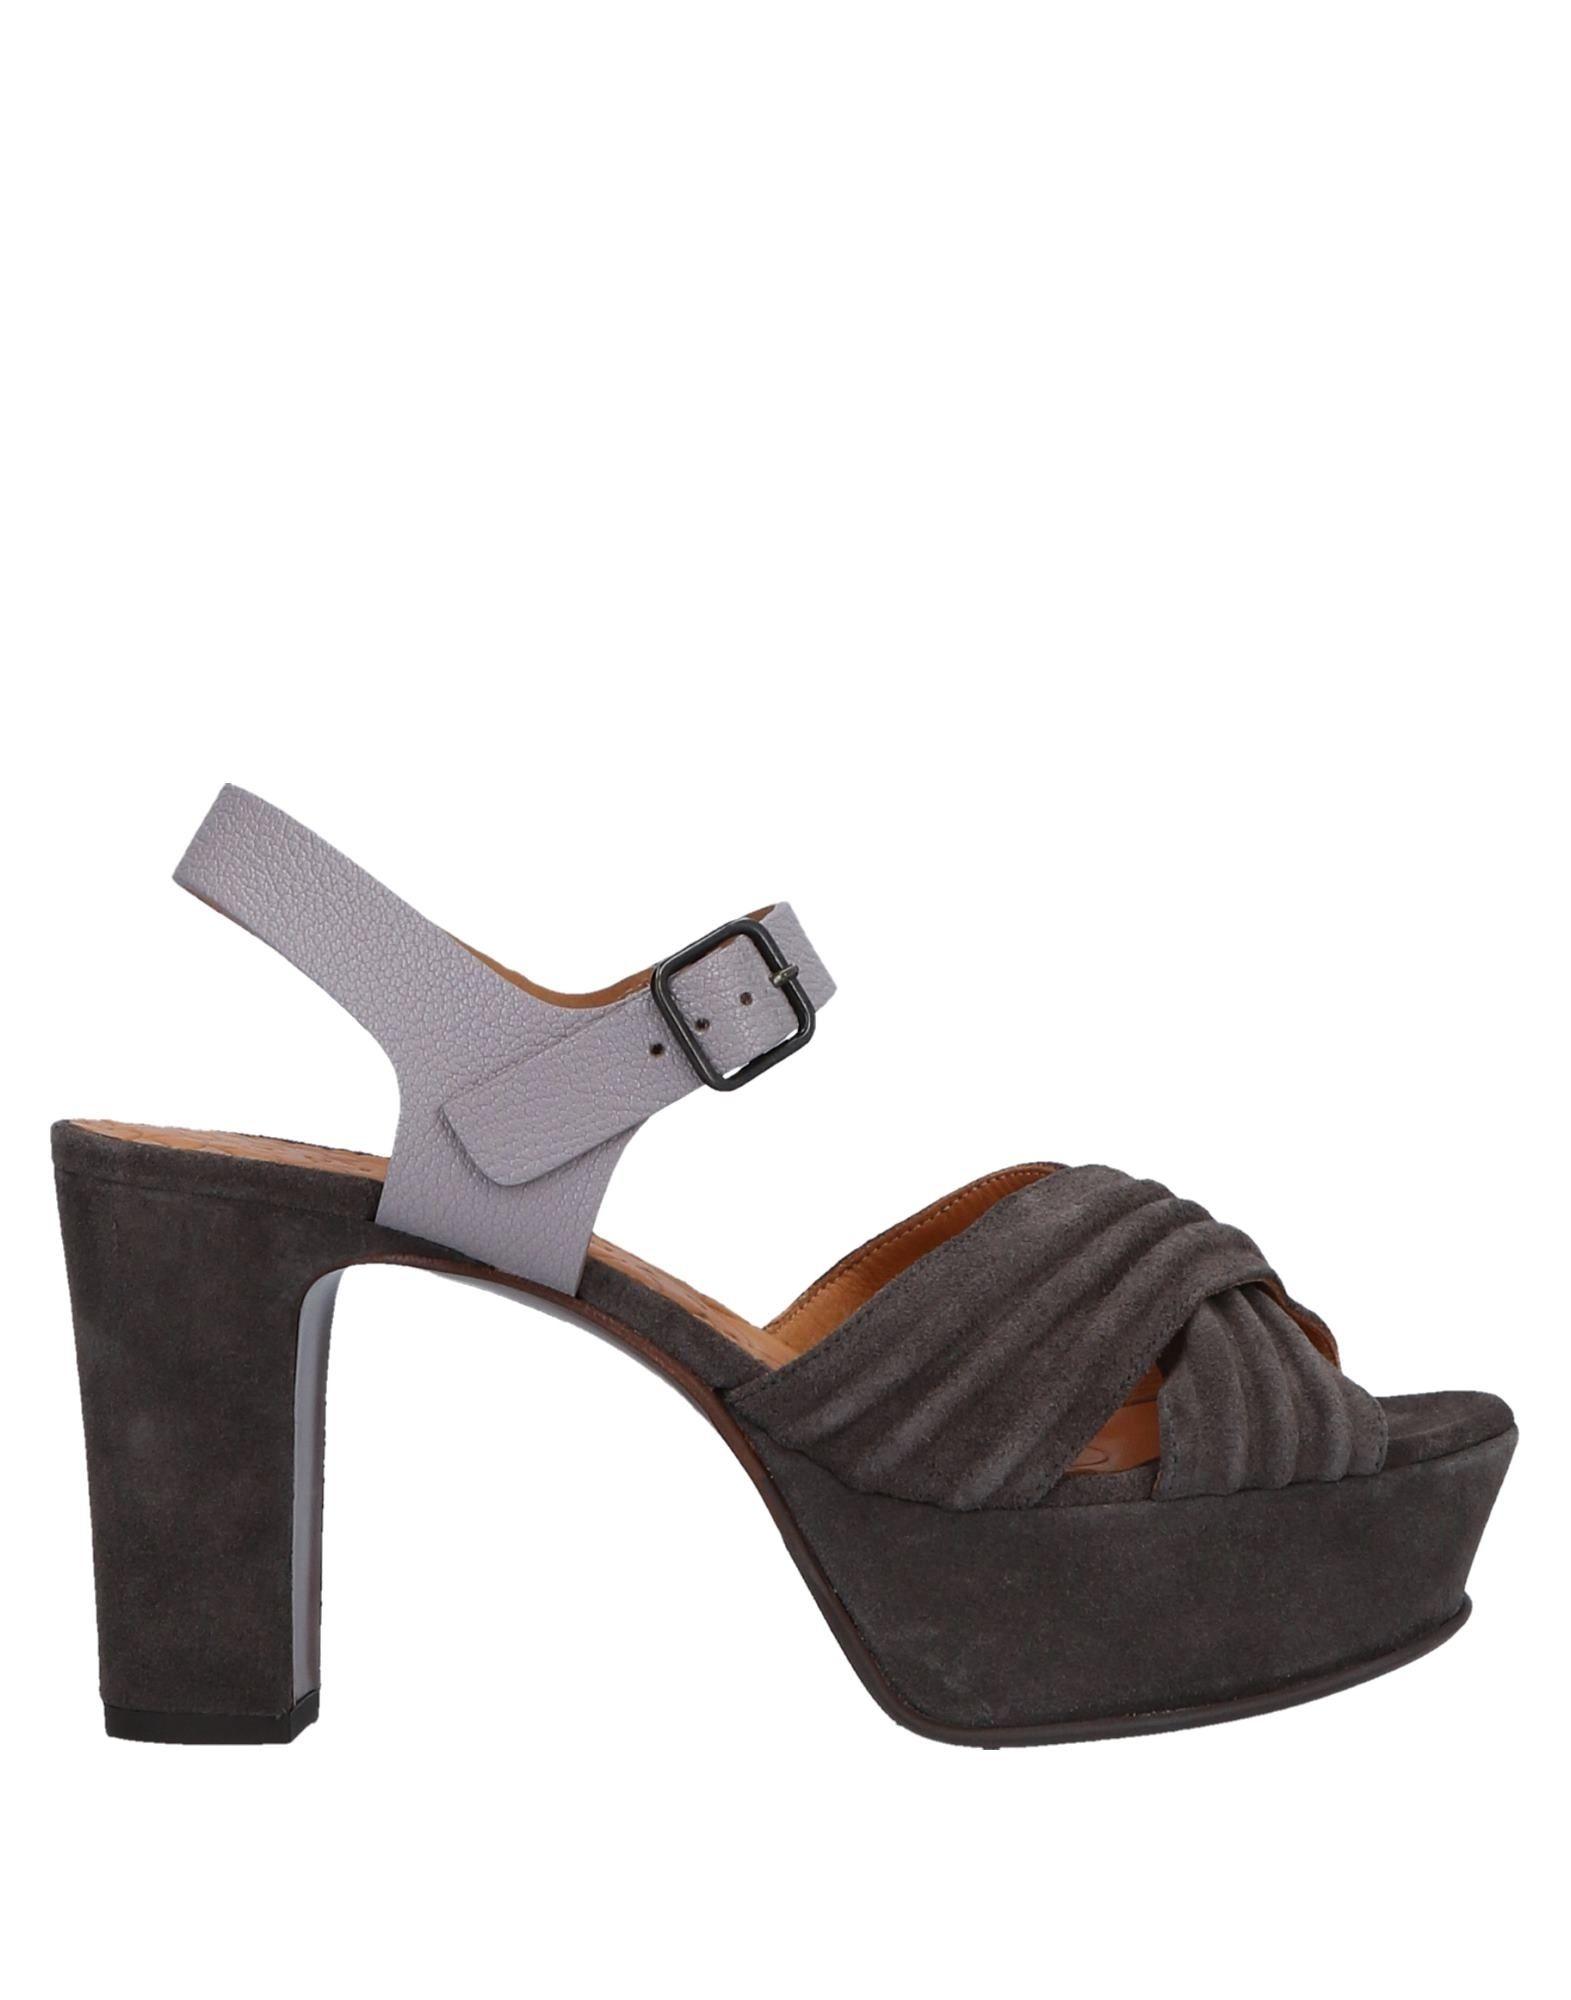 Stilvolle billige Schuhe Damen Chie Mihara Sandalen Damen Schuhe  11498754VC 47634e